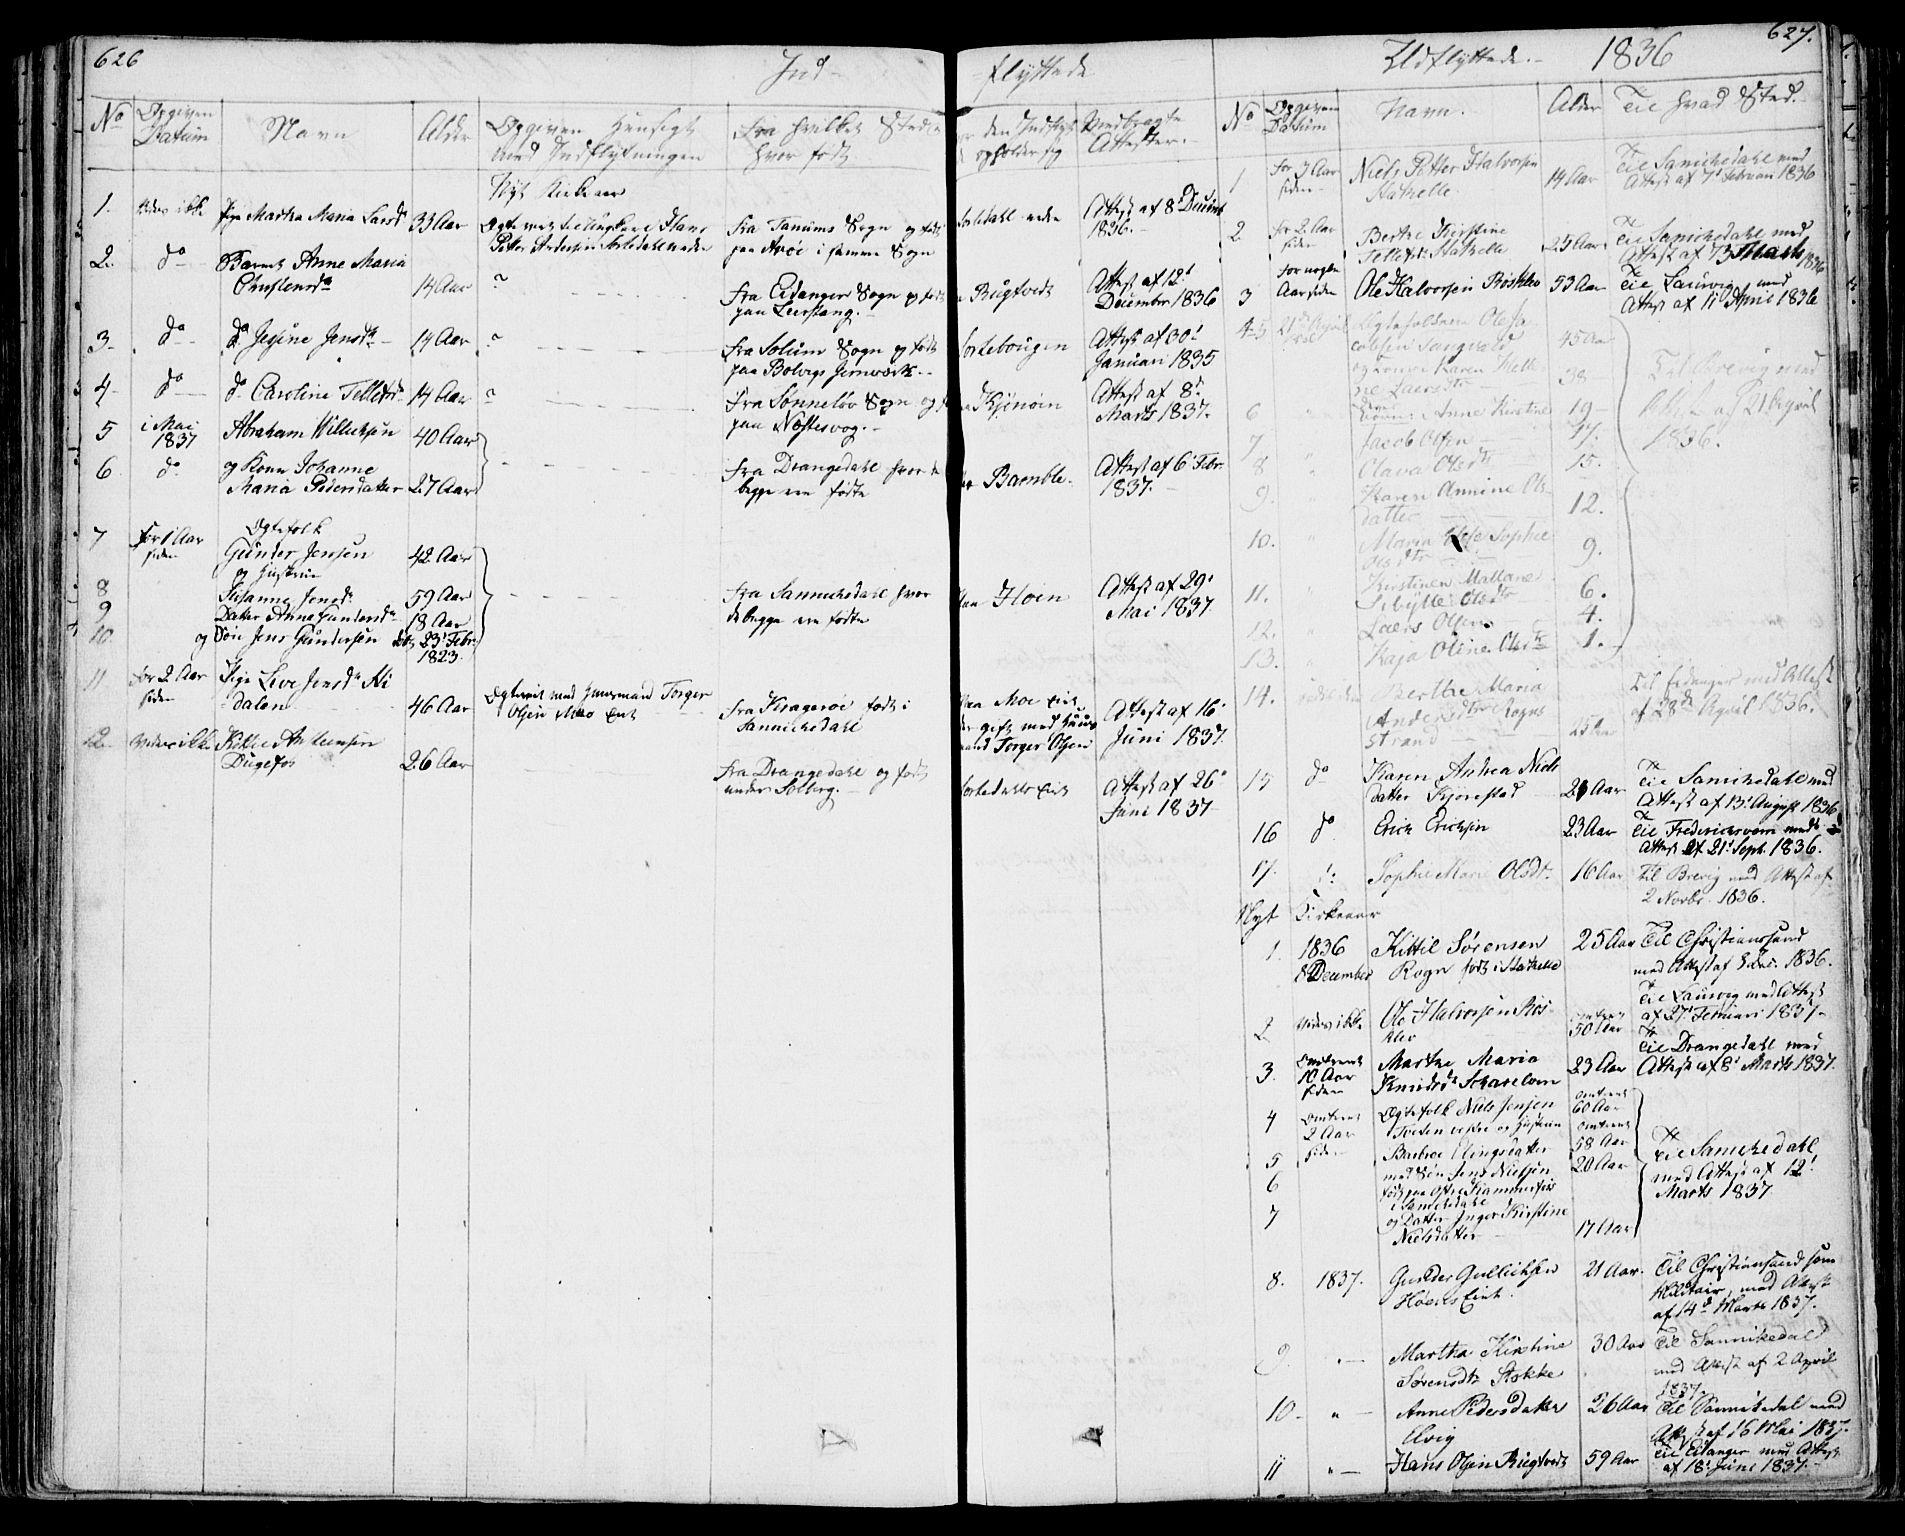 SAKO, Bamble kirkebøker, F/Fa/L0004: Ministerialbok nr. I 4, 1834-1853, s. 628-629